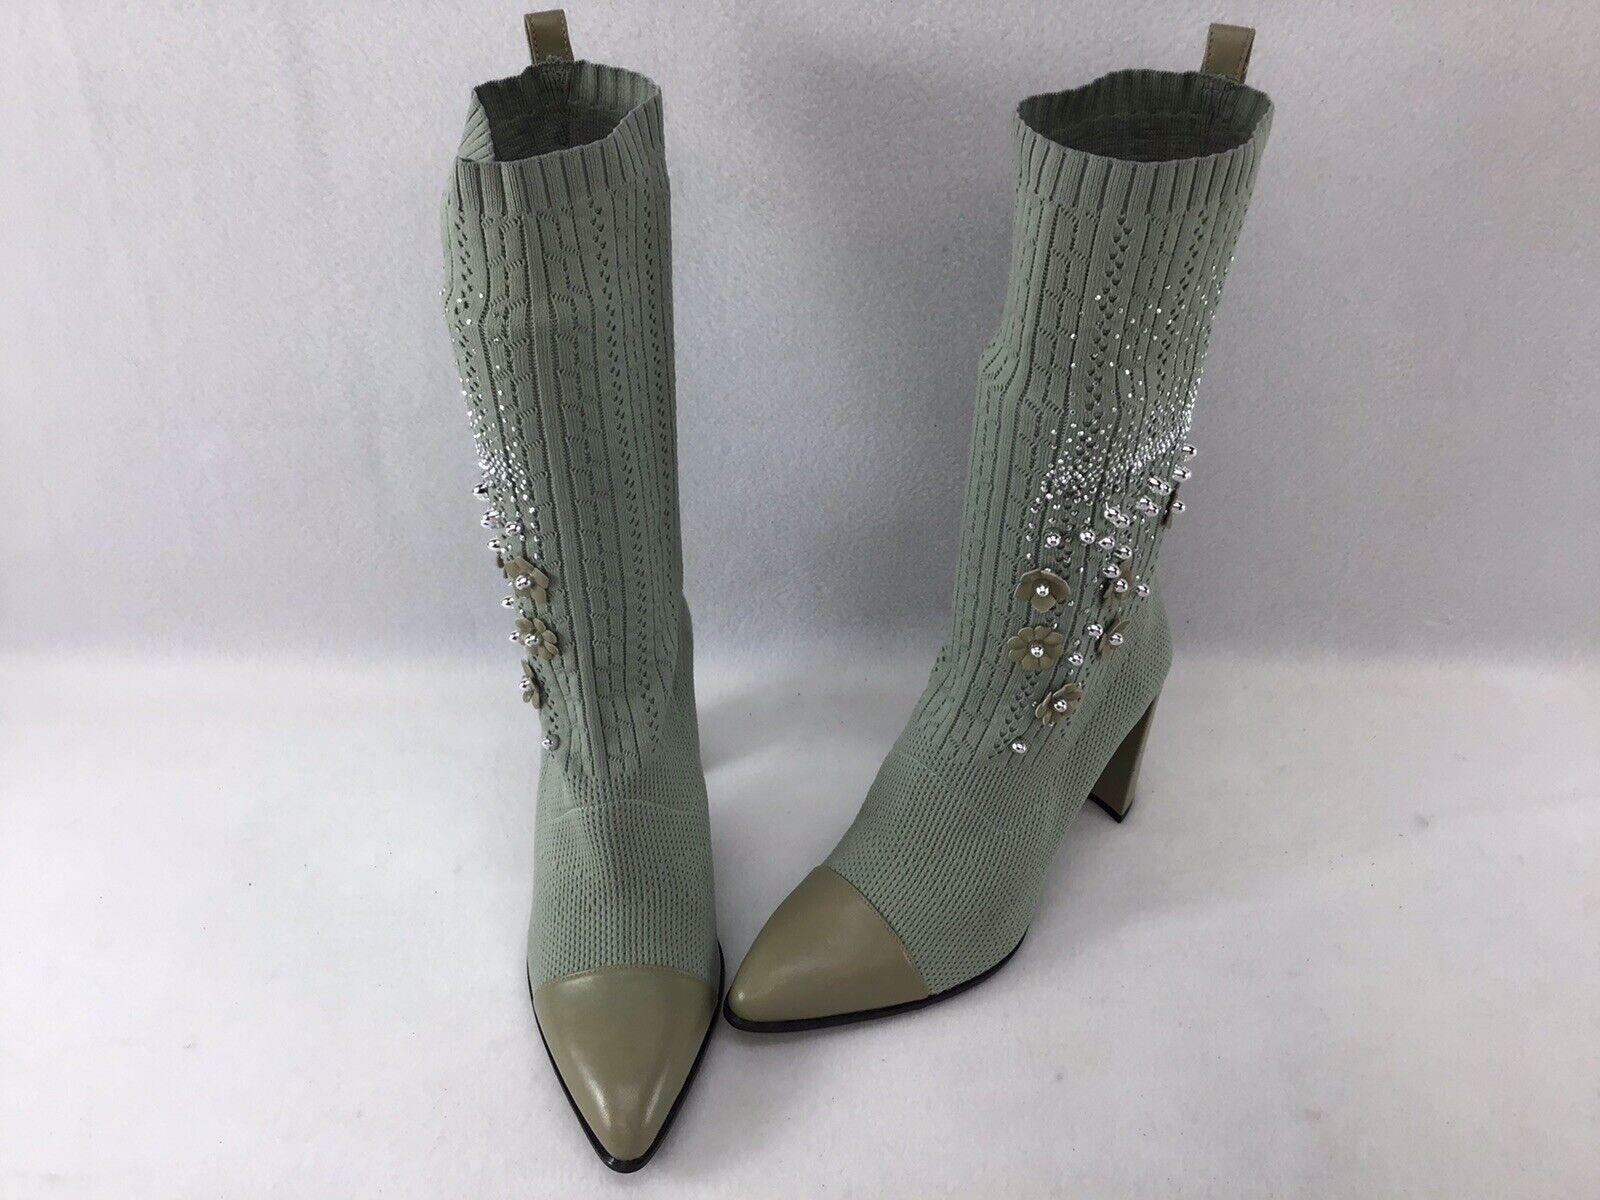 Stuart Weitzman Sockhop Mint Green Knit Leather Sock Booties Size Est. 9  H1190